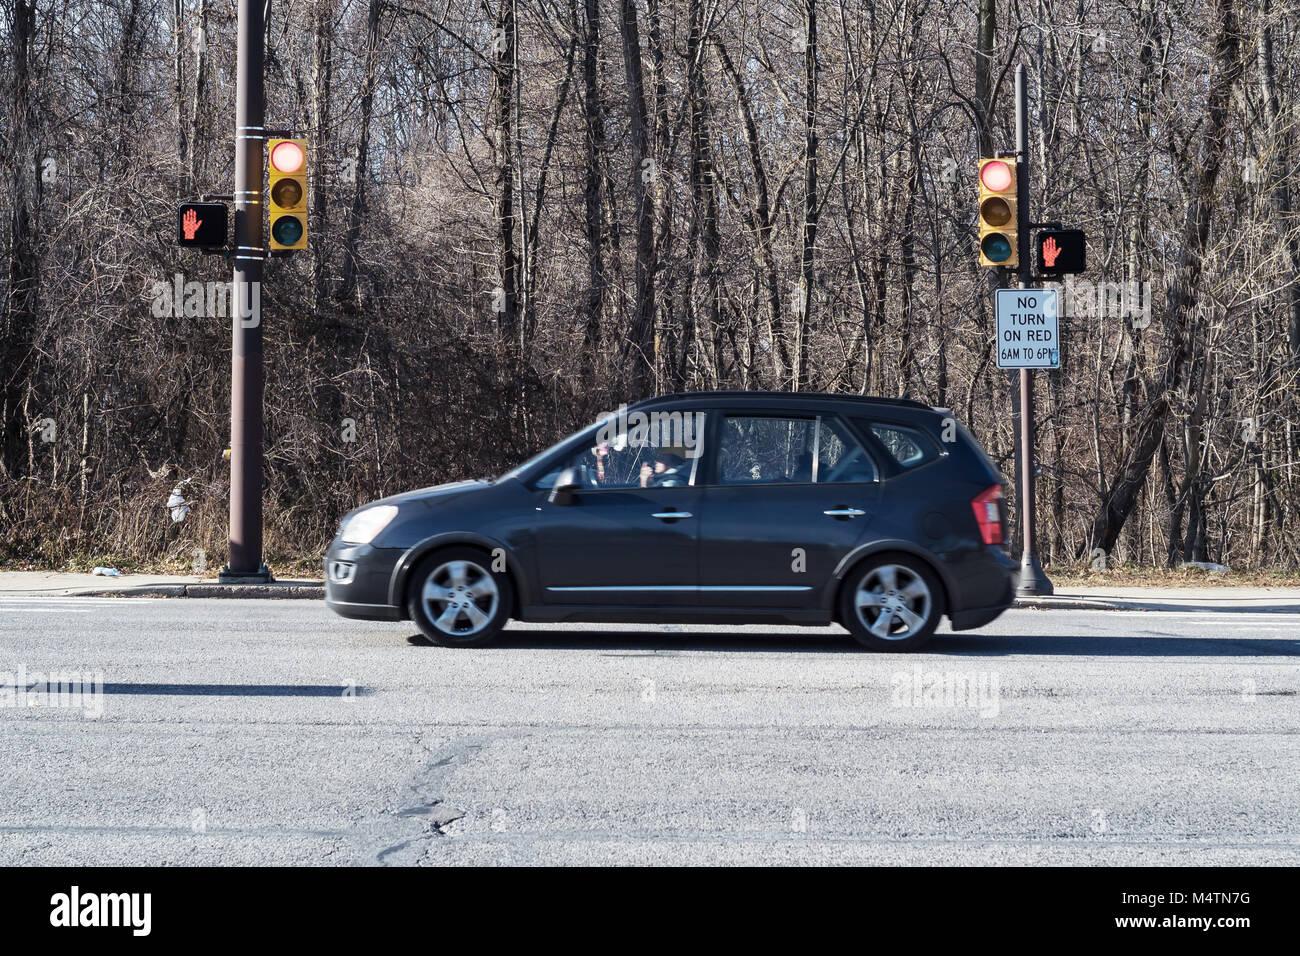 Traffic sign, Northeast Philadelphia, USA - Stock Image